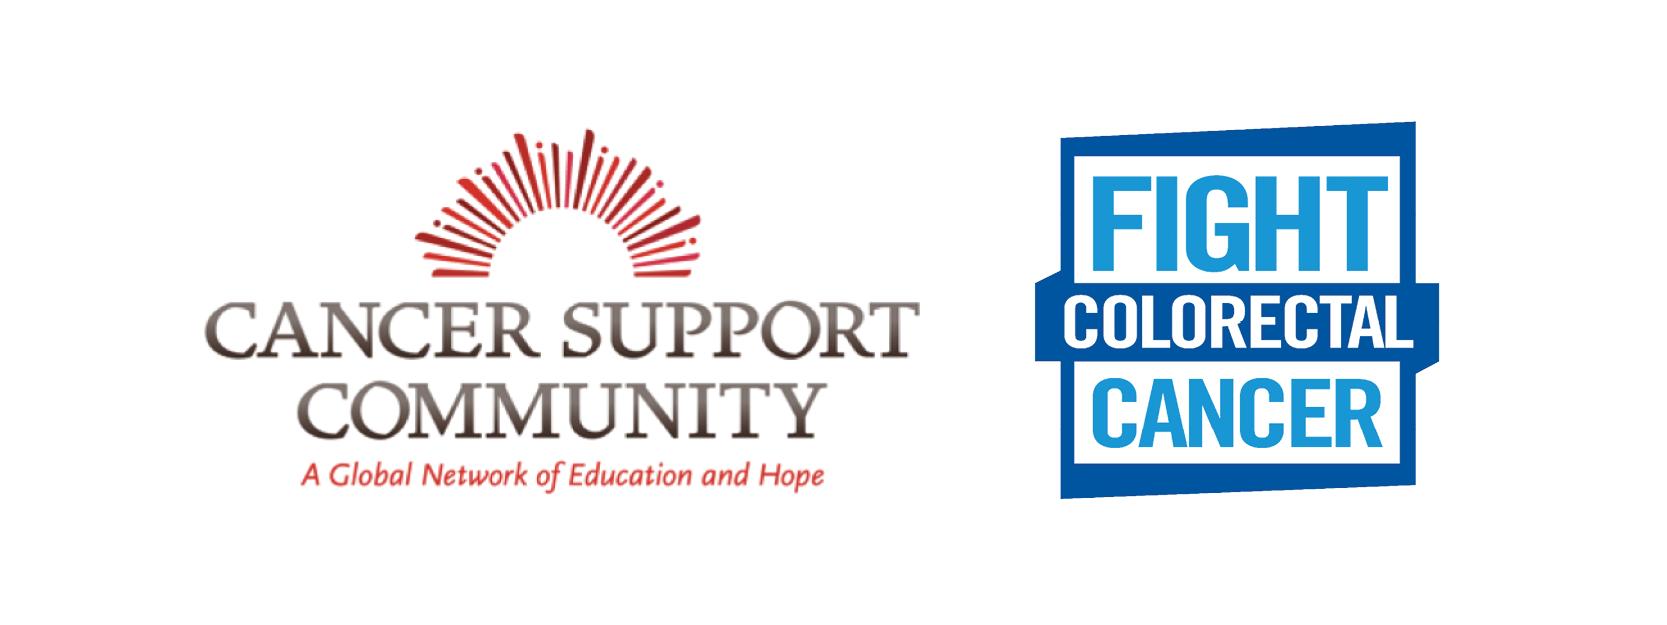 FightCRC_CSC_Coloncancer_HelplinePartnership